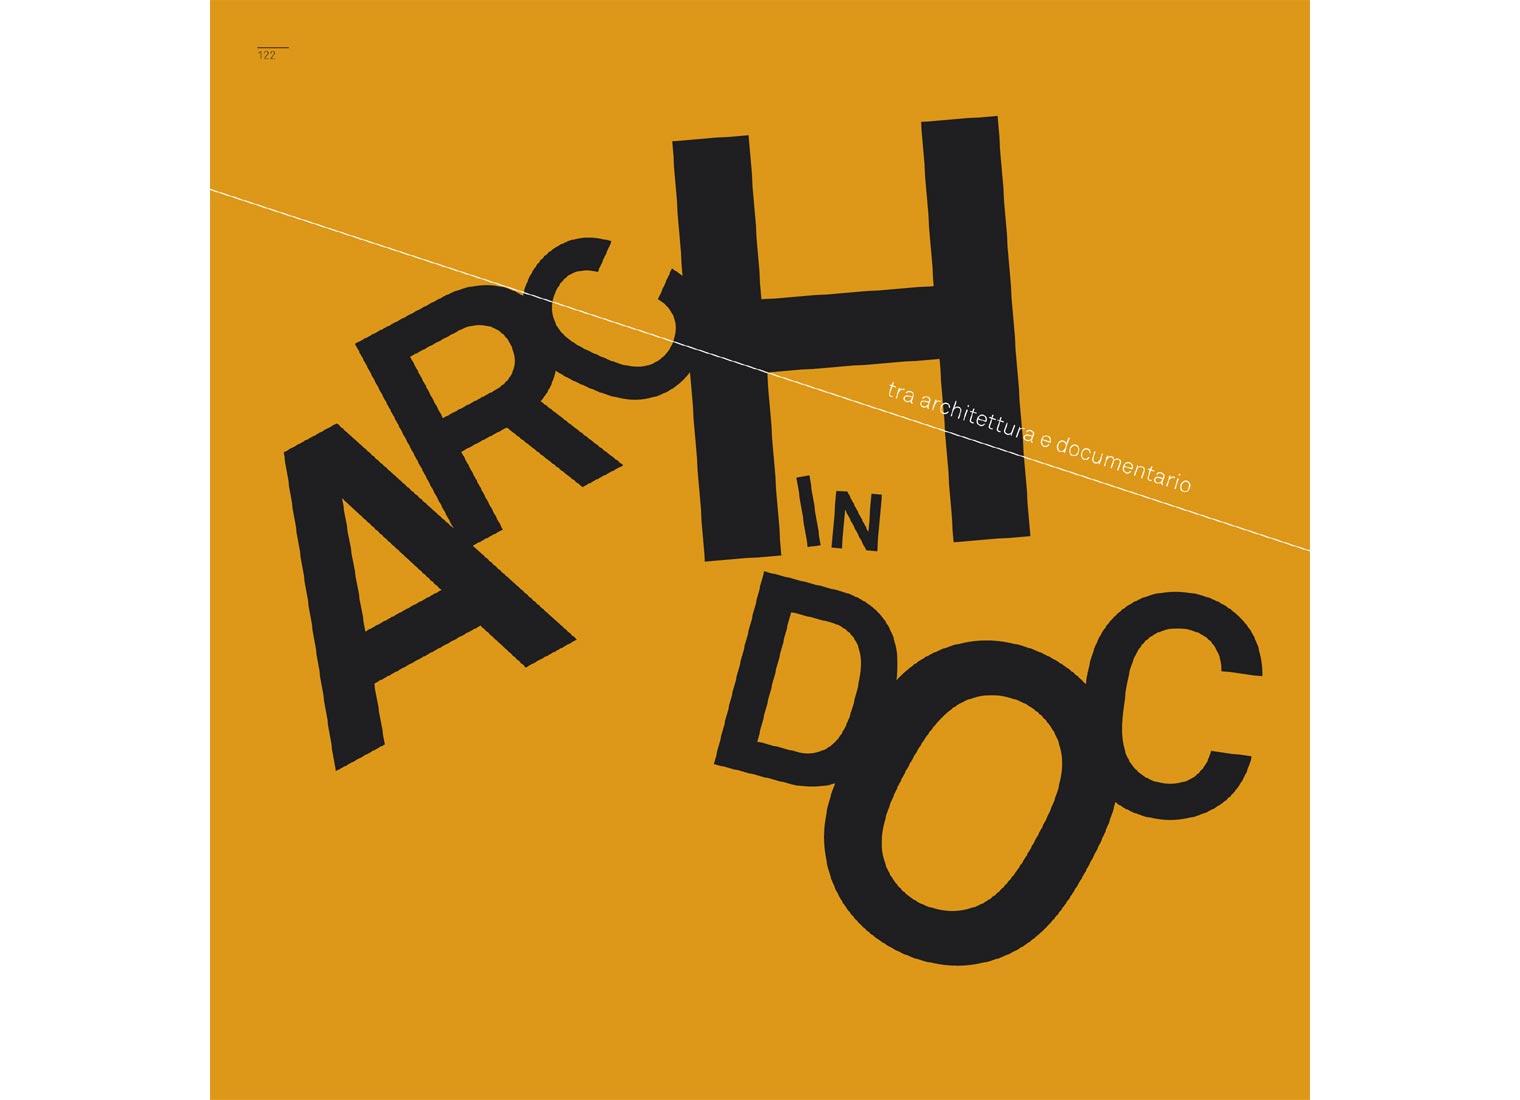 vk-architetti_archindoc_20